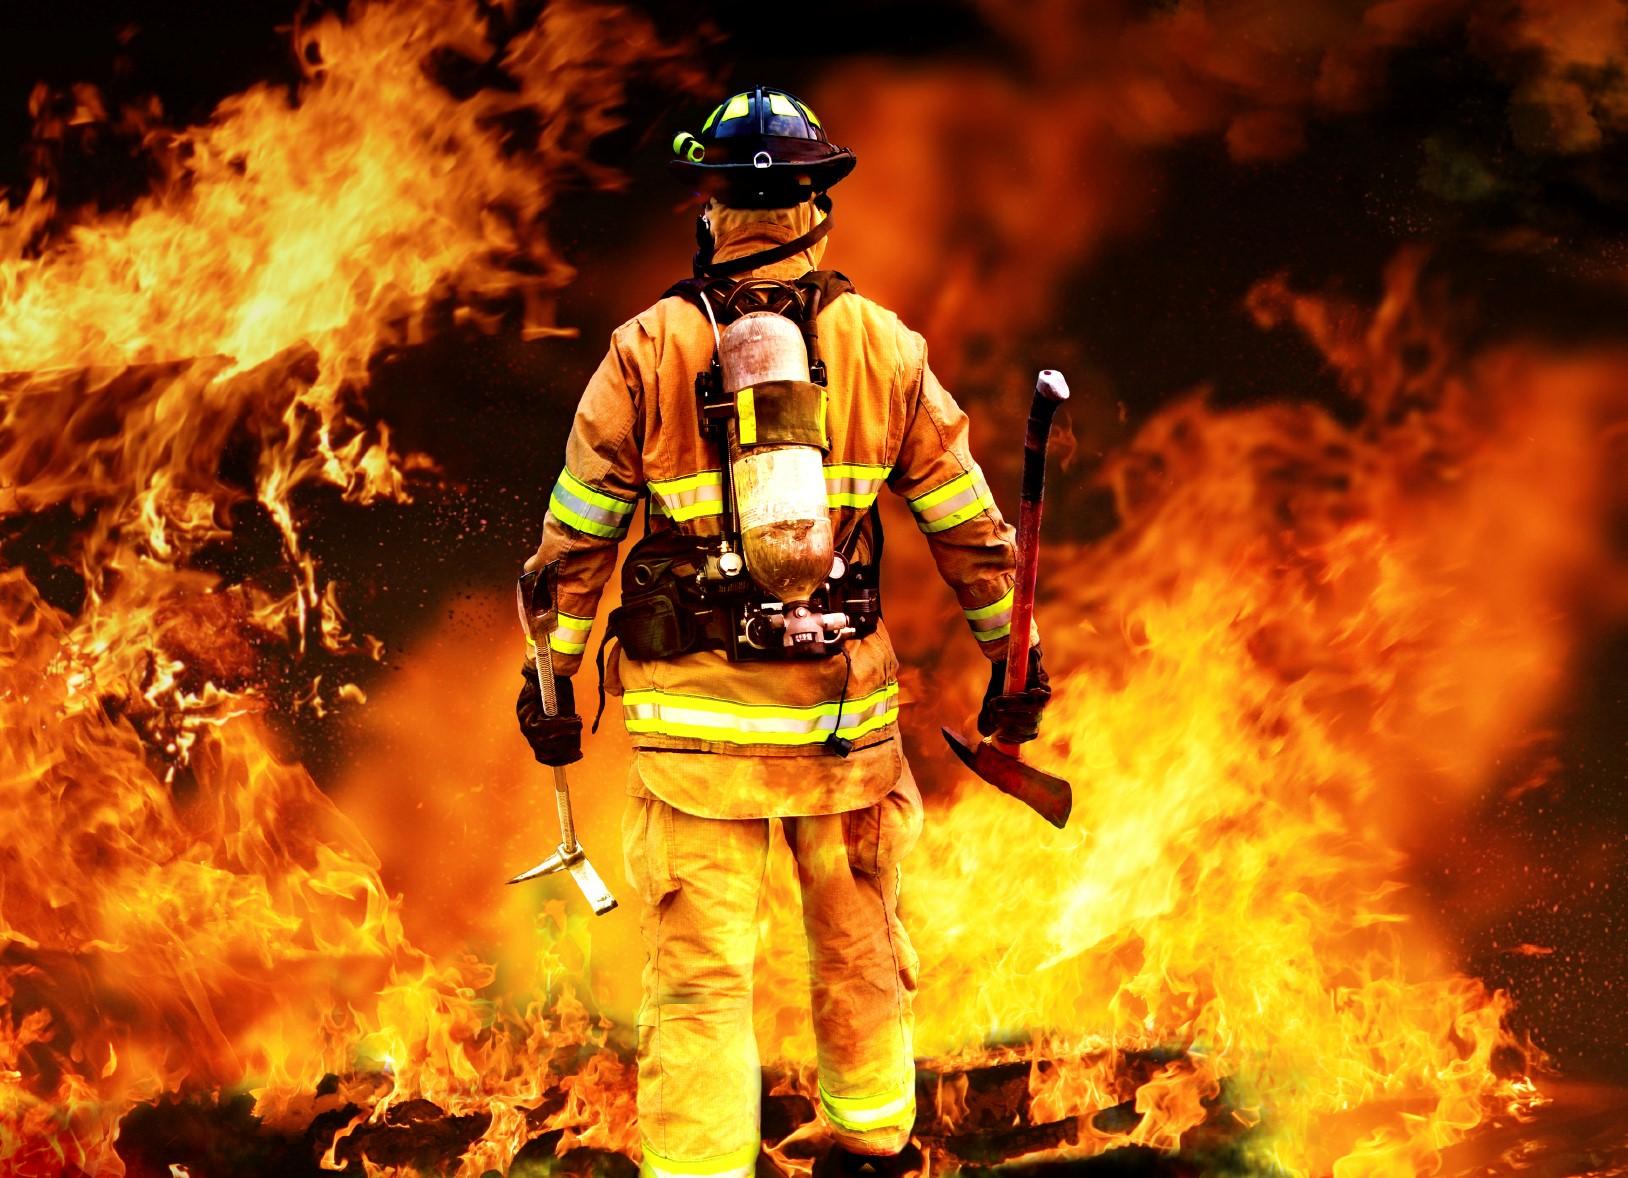 3. Firefighters   Top 9 Most Dangerous Jobs in the World   Brain Berries